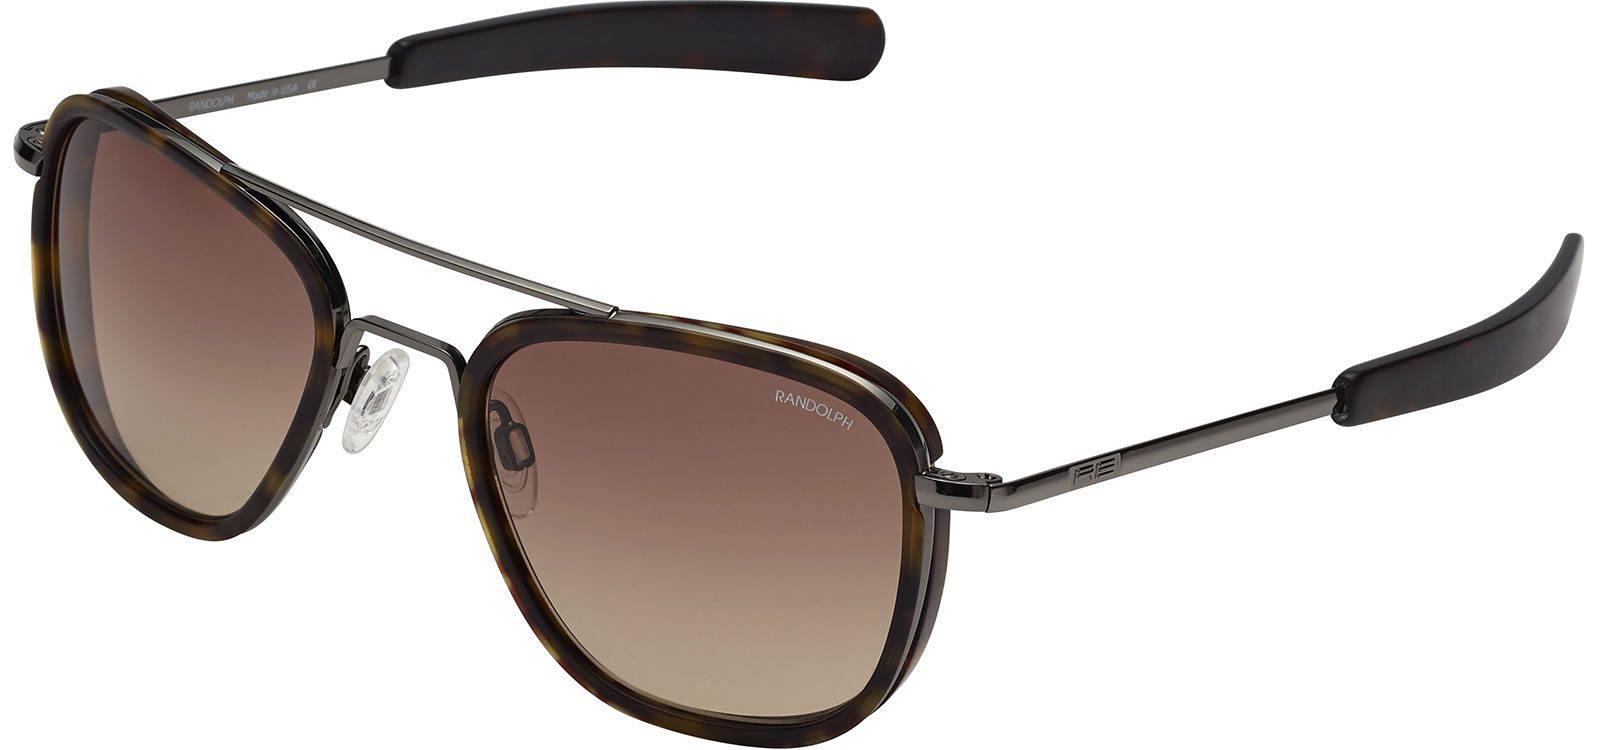 5899275f6b1 ... Randolph Aviator AI007 Gunmetal Tan Gradient 58mm Sonnenbrillen von Randolph  Engineering   2 + ...